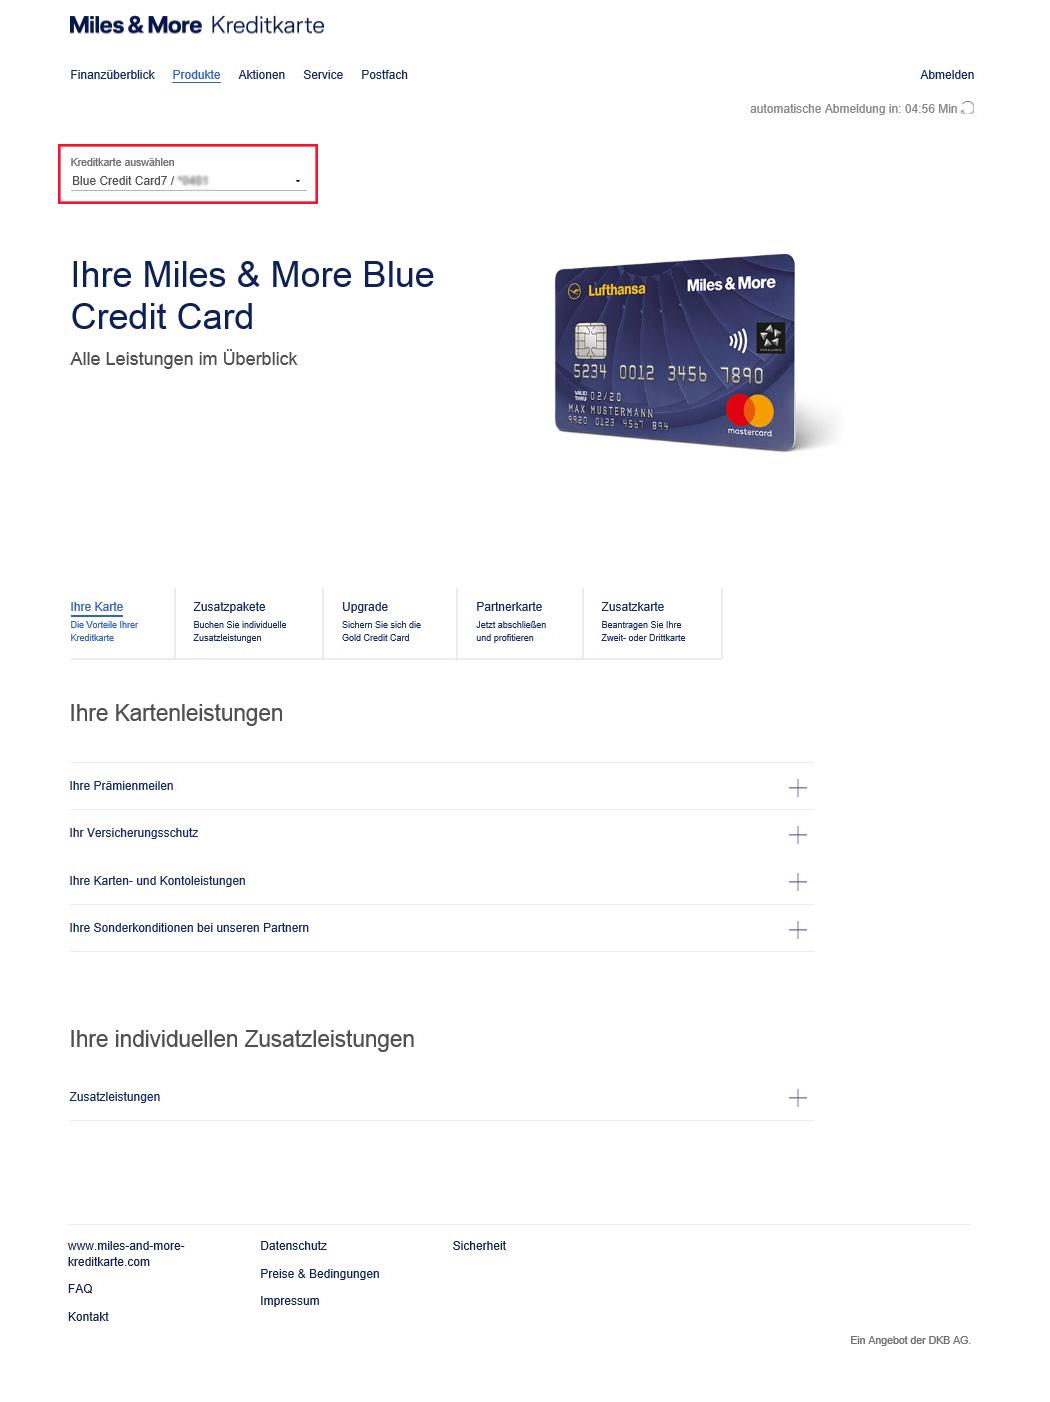 online kartenkonto kurz erkl rt miles more kreditkarte. Black Bedroom Furniture Sets. Home Design Ideas